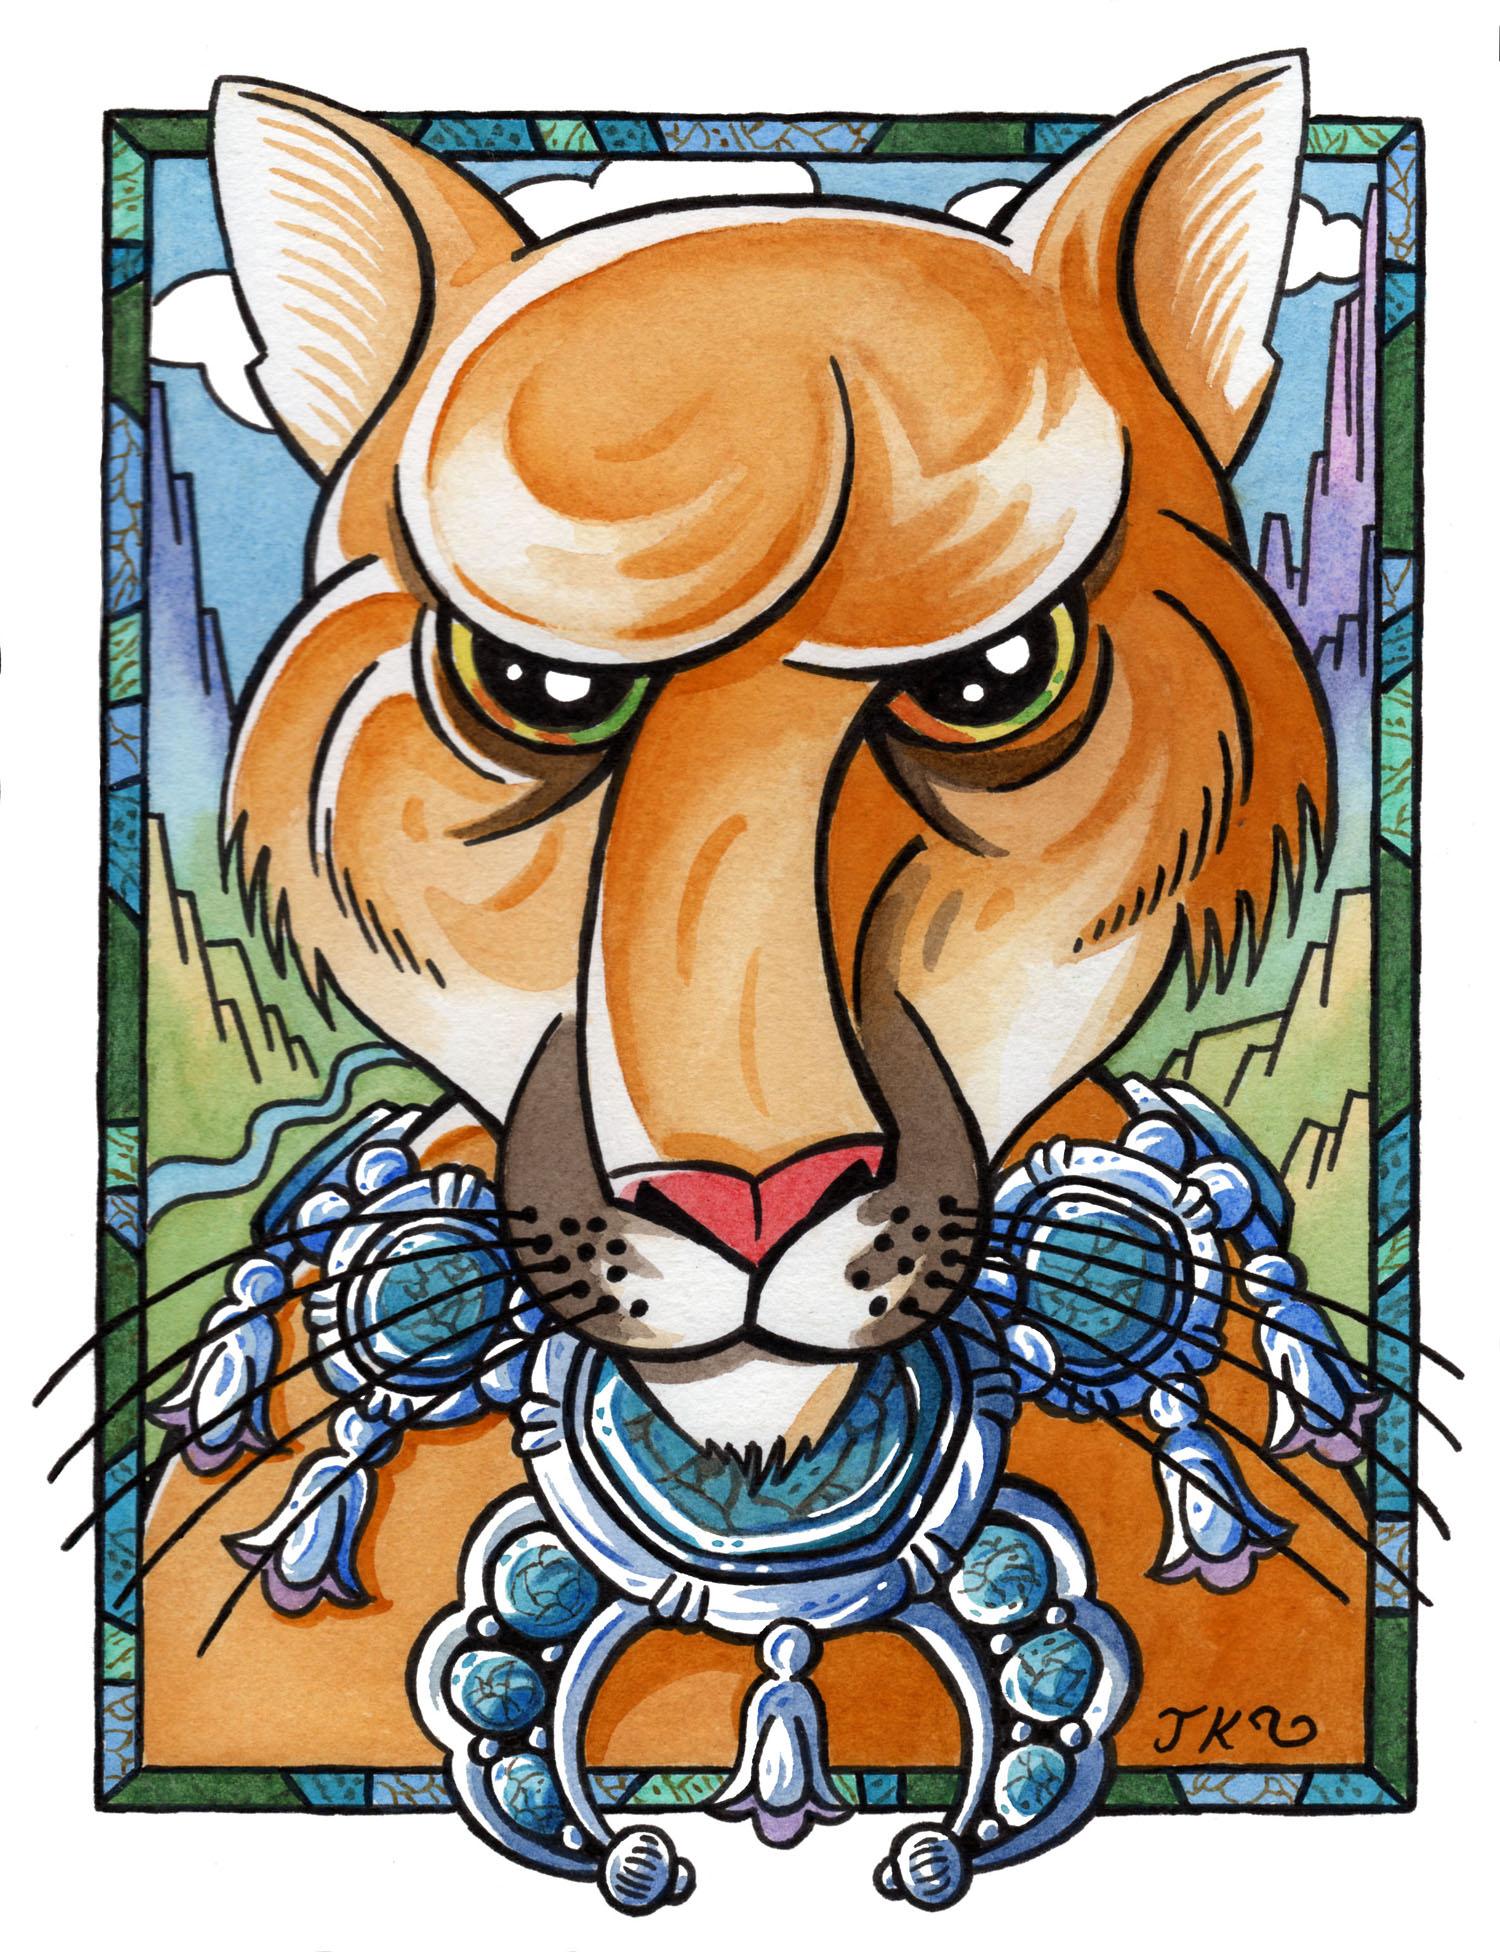 Santa Fe Cougar